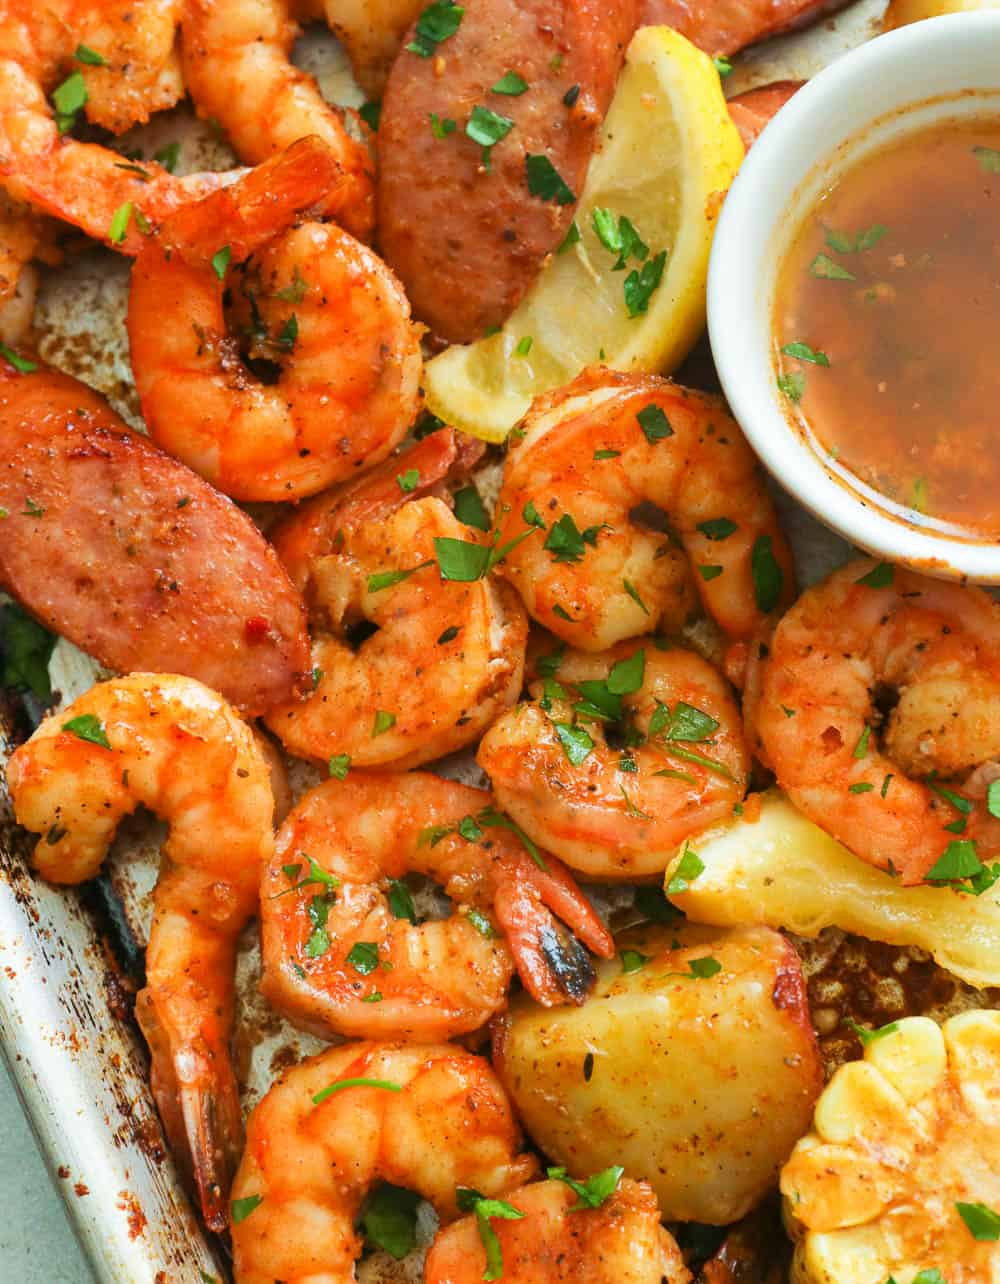 A close up shot of Cajun shrimp boil with Creole Butter sauce